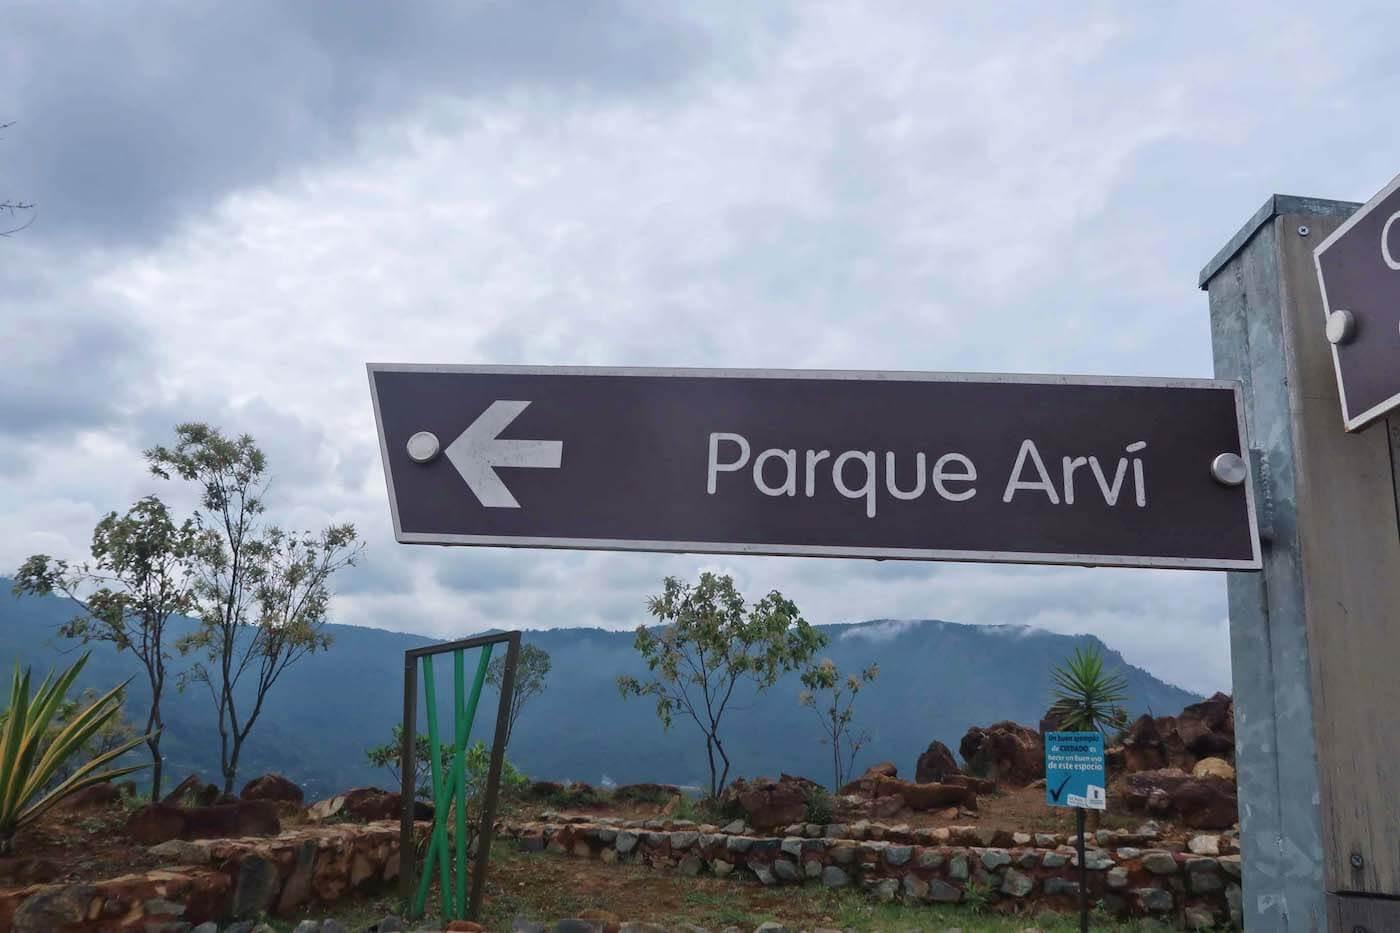 Sign for Parque Arvi